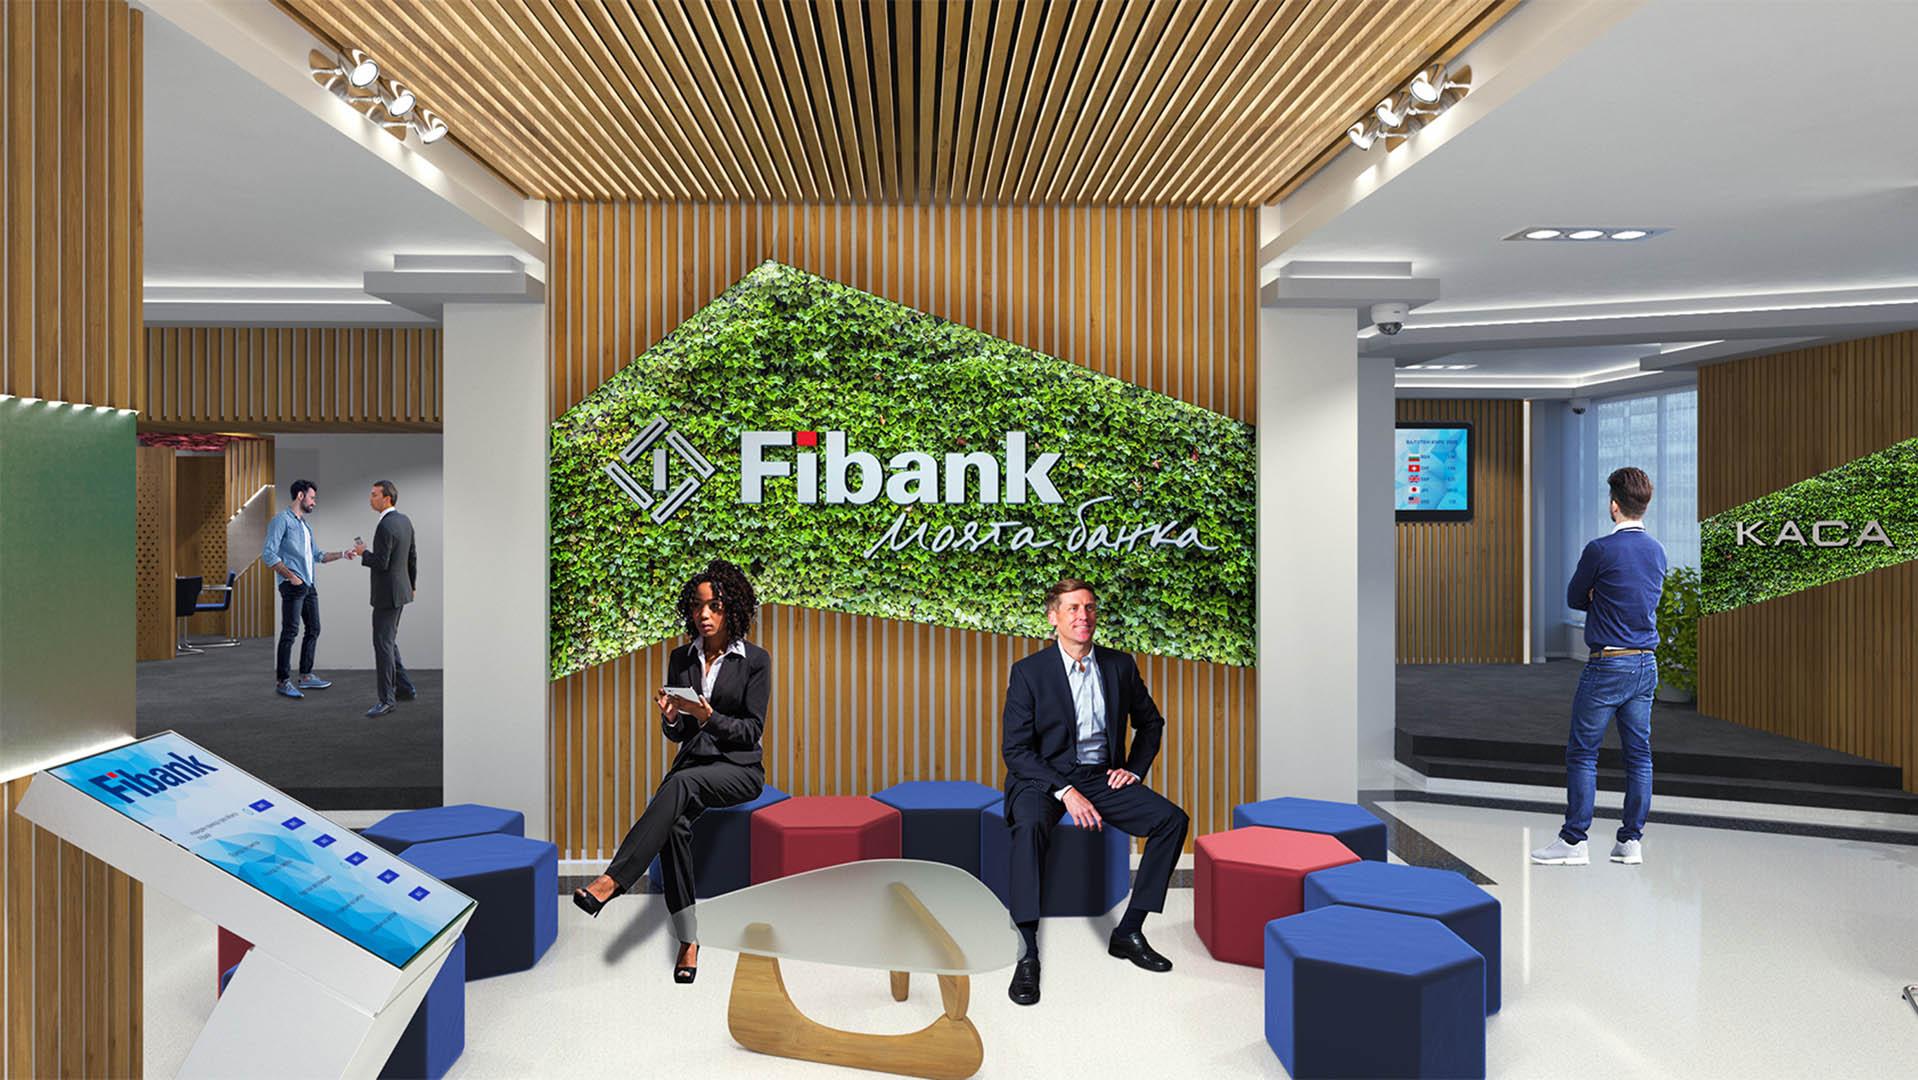 fi-bank-erich-milenov-krasimir-kapitanov-sharp-contrast-office-renovation-interior-design-chakalnq